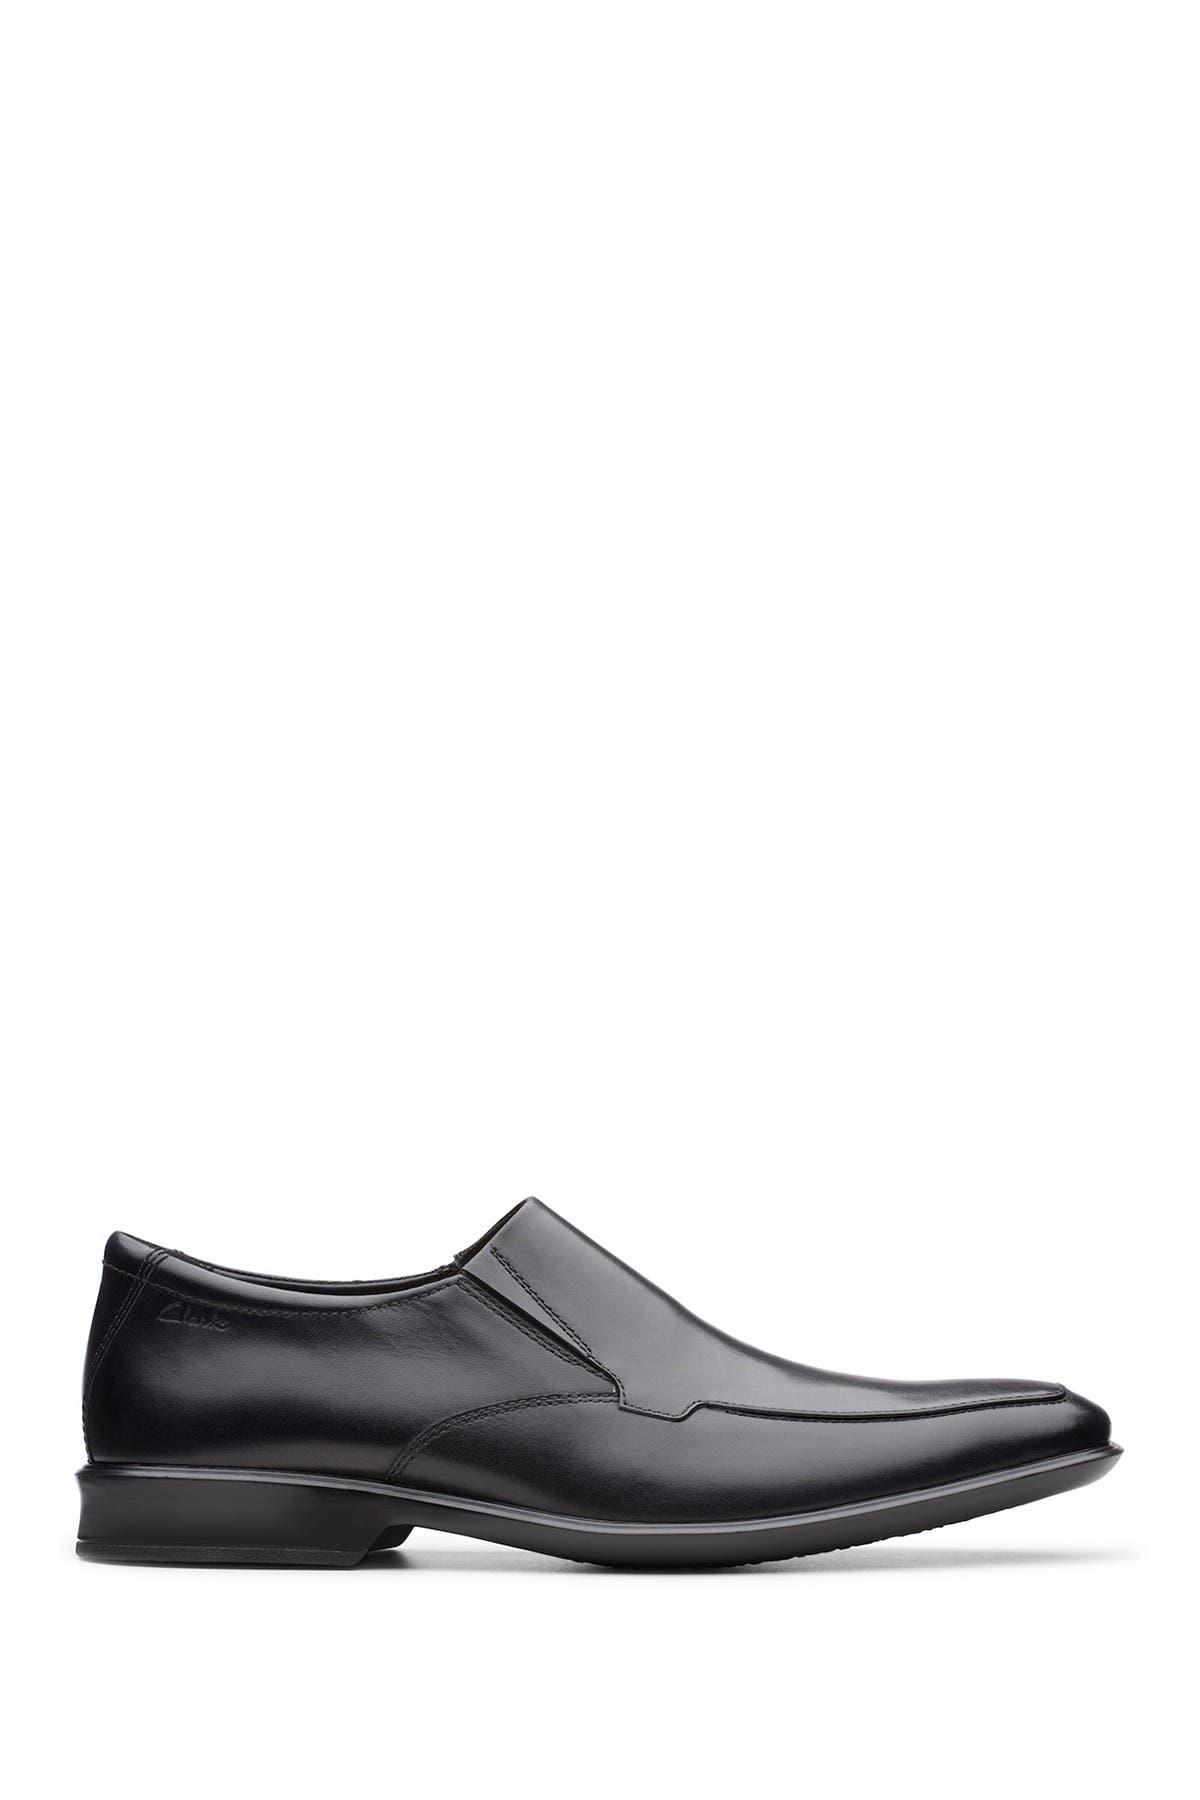 Image of Clarks Bensley Slip-On Loafer